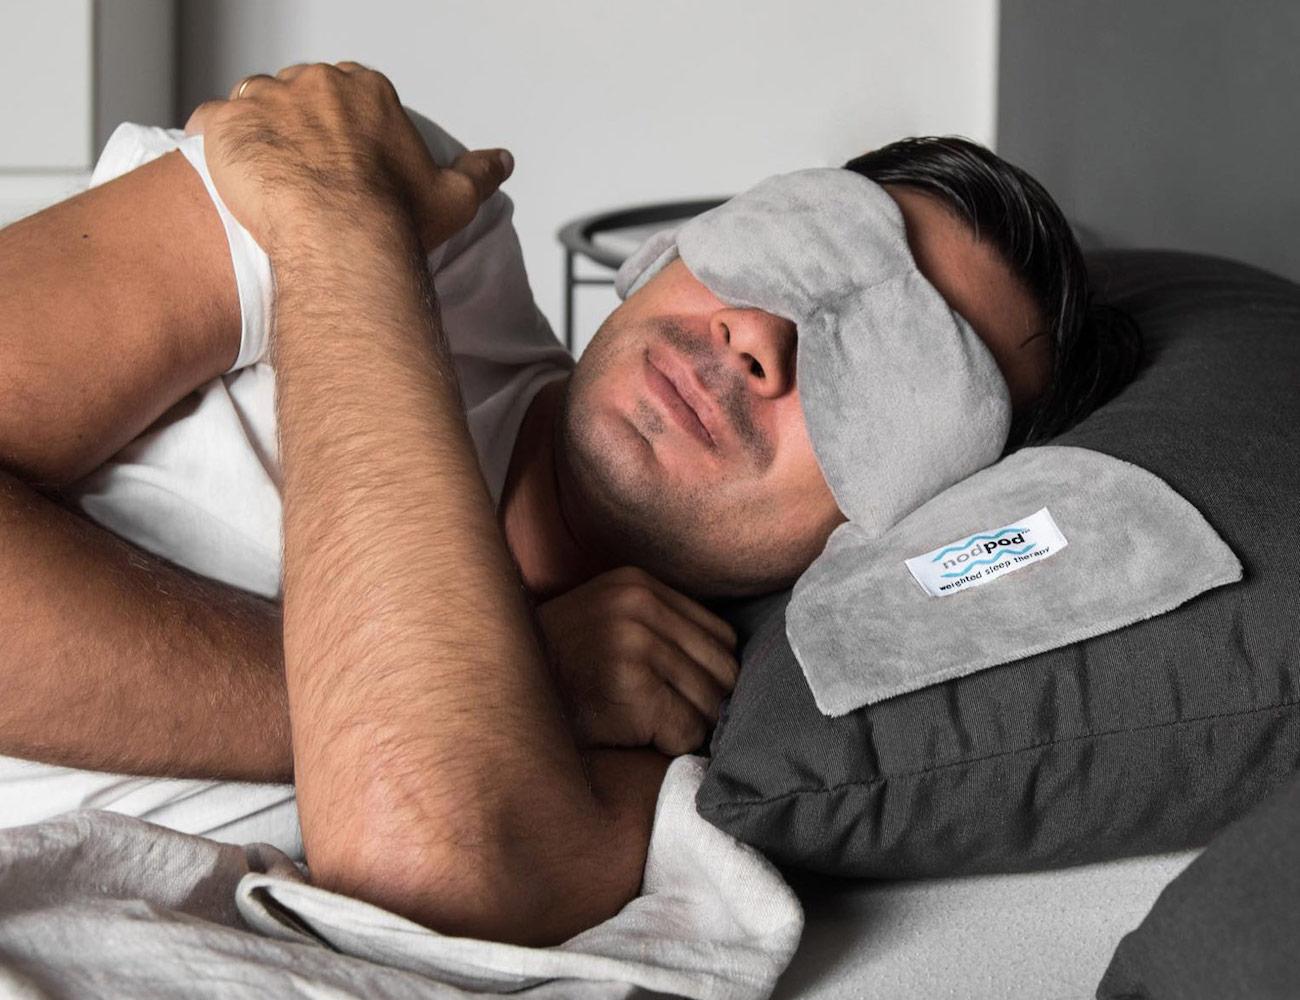 10 Sleep tech gadgets to help you get some shuteye - nodpod 0